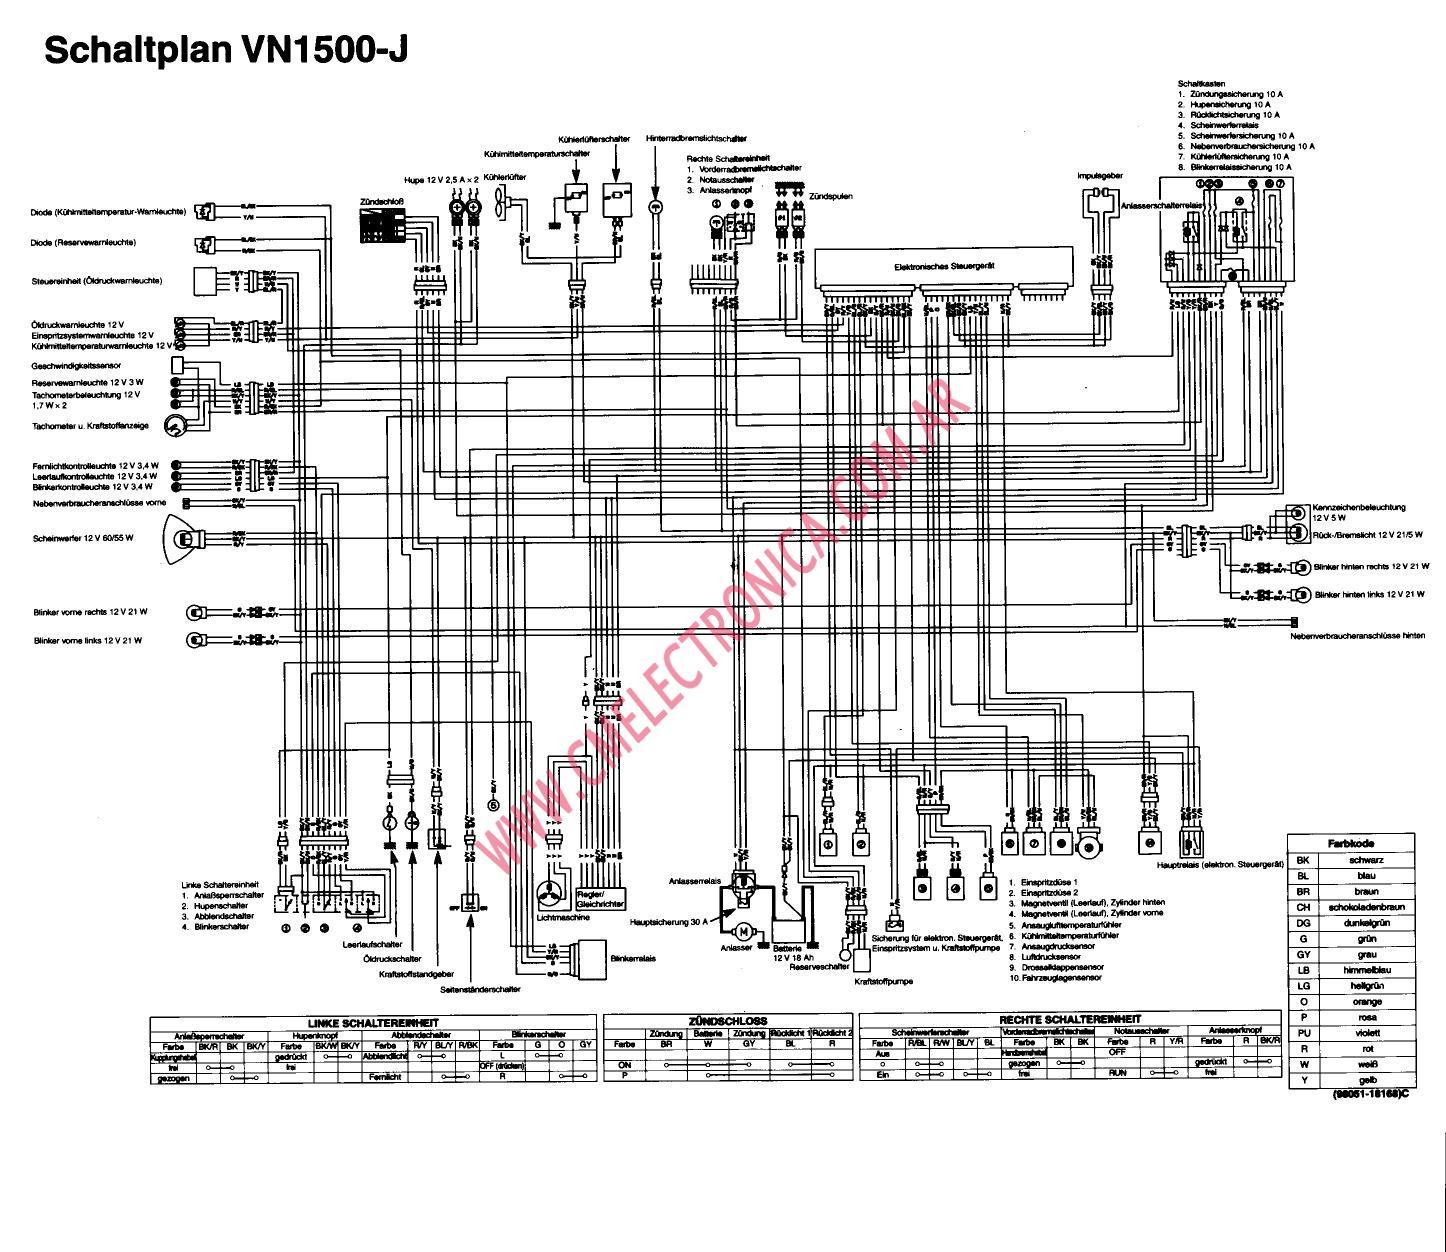 1997 kawasaki vulcan 1500 wiring diagram rz 3527  oem kawasaki vulcan 1500 wiring diagram free diagram  oem kawasaki vulcan 1500 wiring diagram